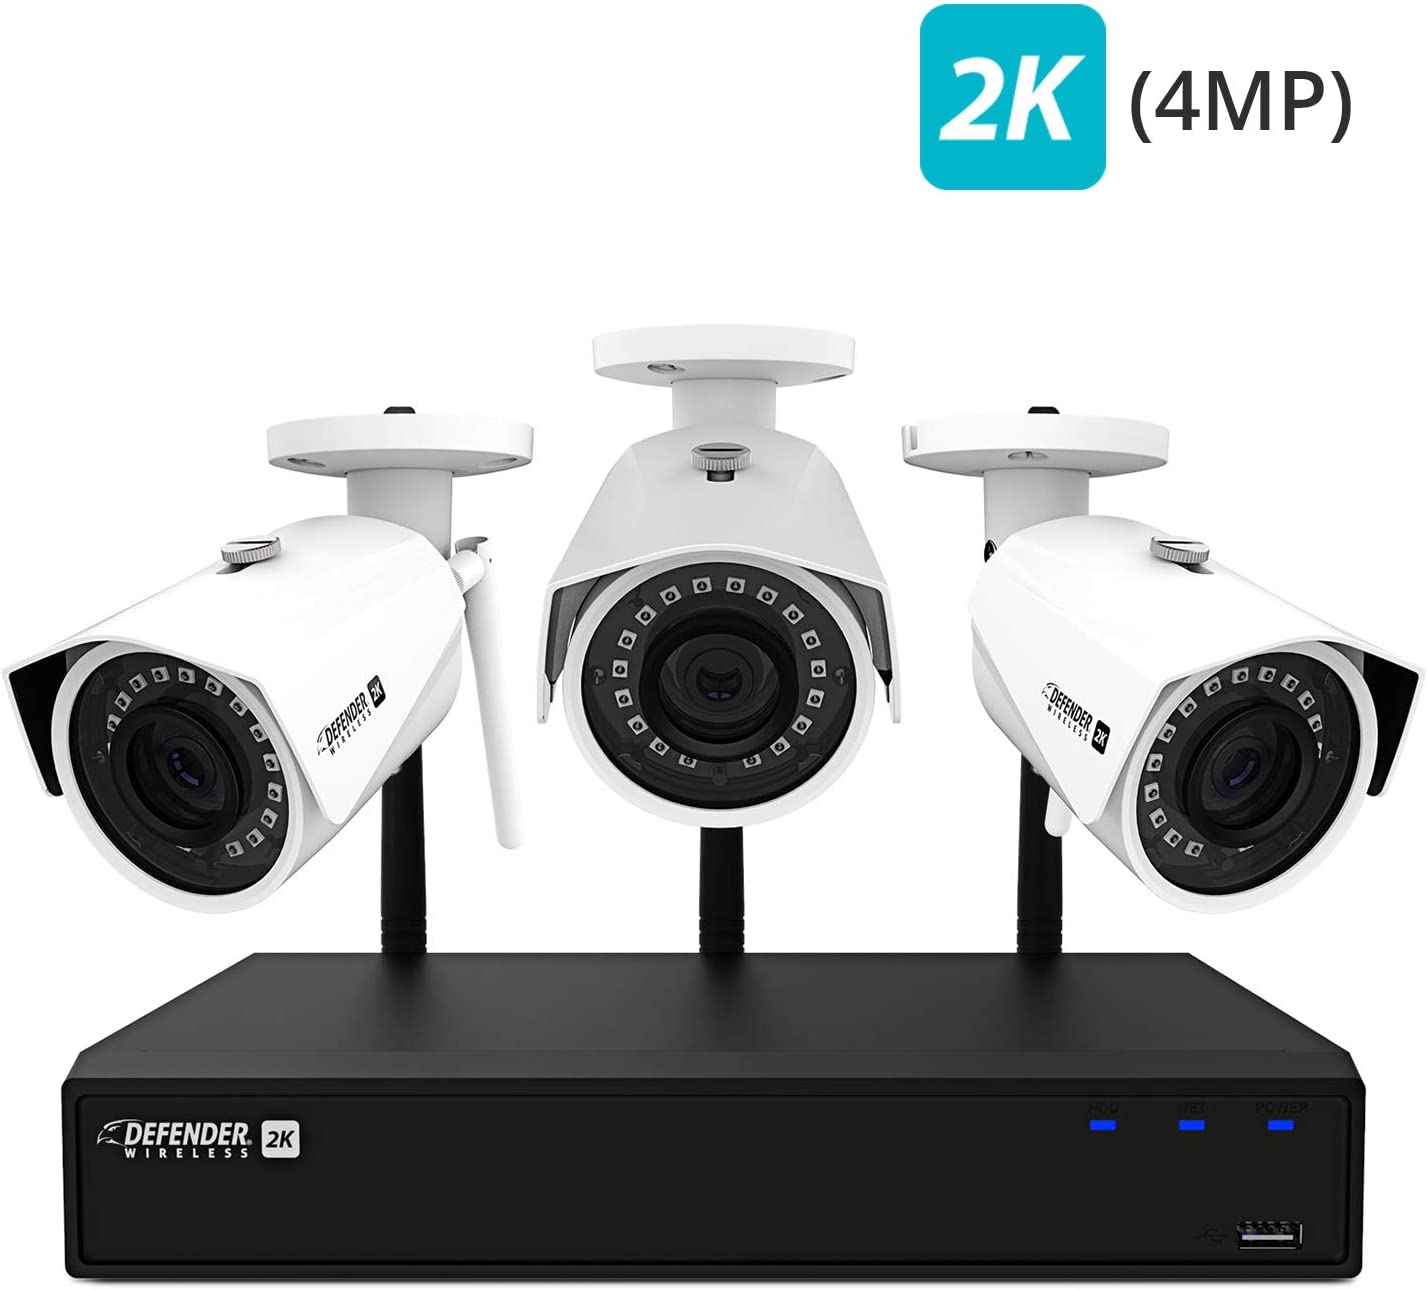 alpha-ene.co.jp Electronics Security & Surveillance 4MP Wireless 4 ...